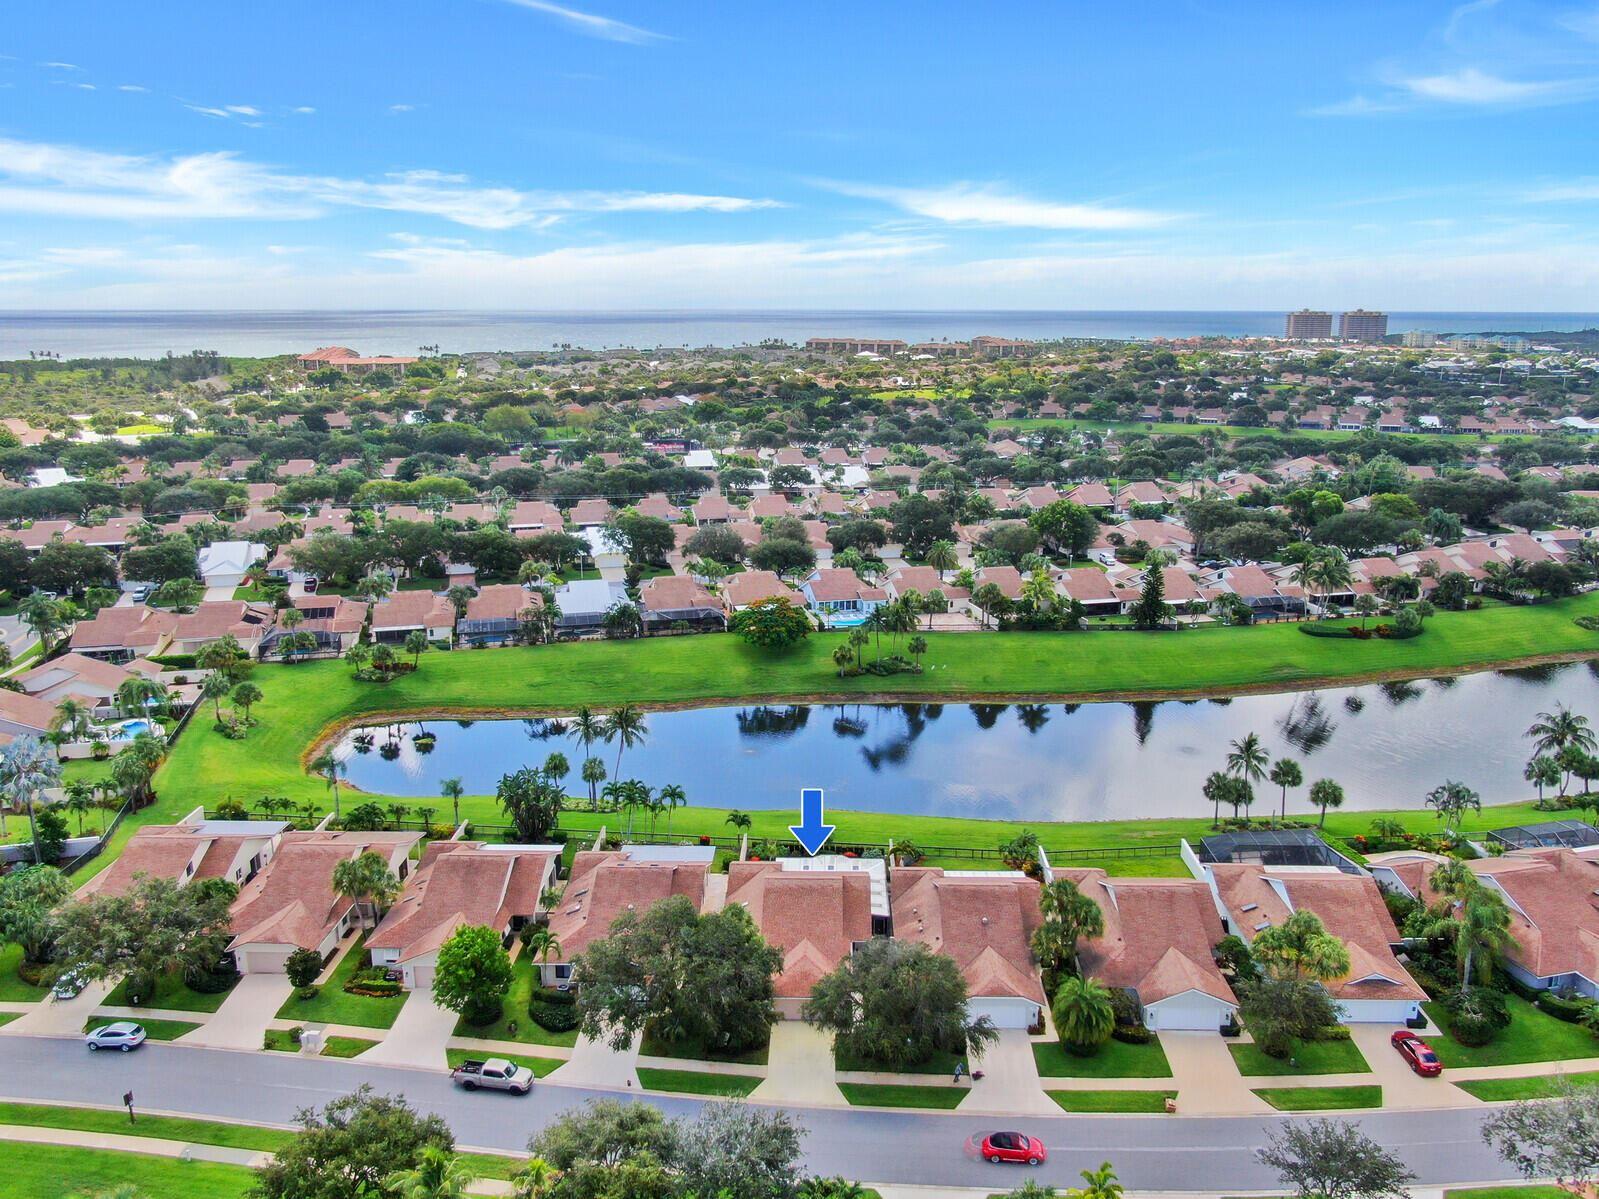 Photo of 251 River Park Drive, Jupiter, FL 33477 (MLS # RX-10727520)